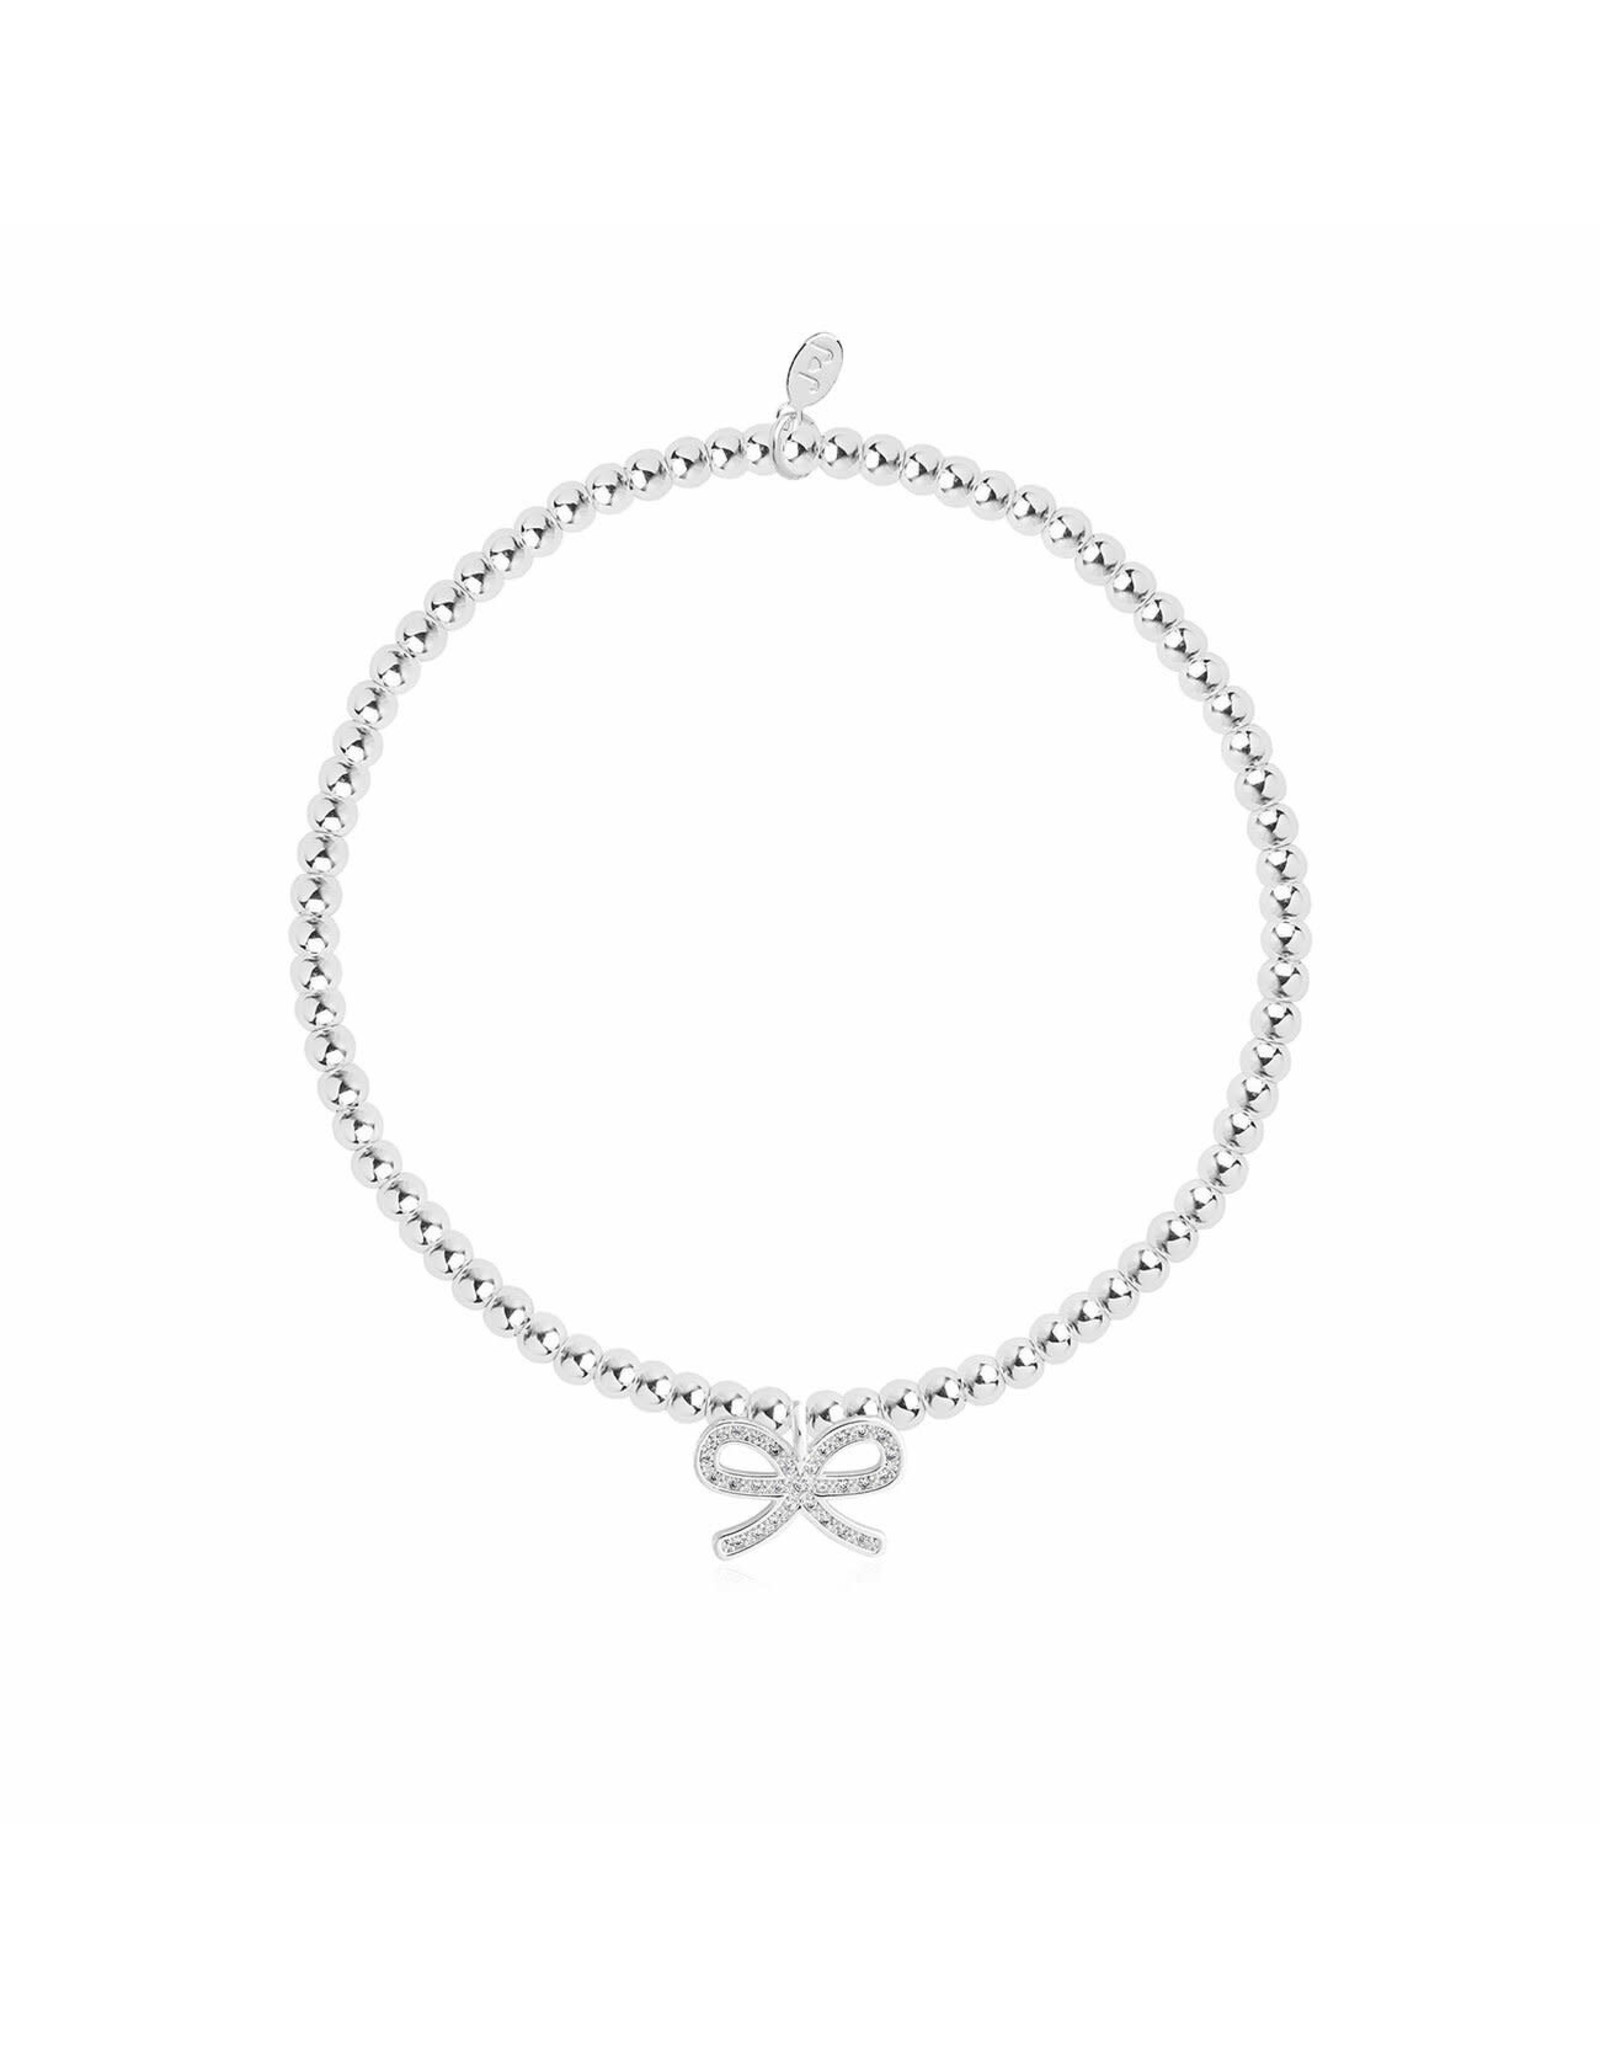 Joma Jewellery A Little - Thank You - Armband